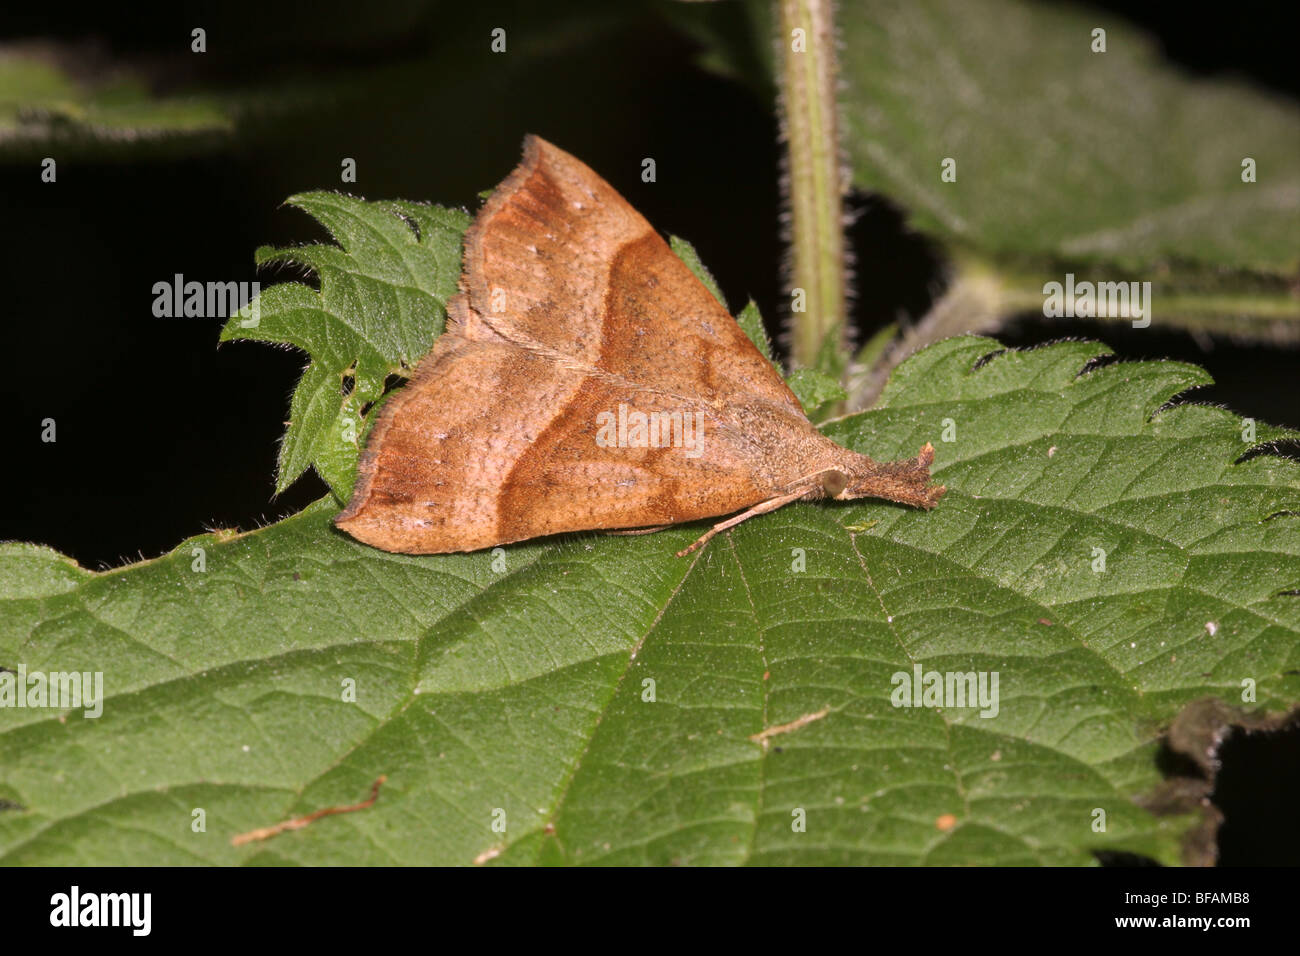 Snout moth (Hypena proboscidalis : Noctuidae) resting in full view and resemblinbg a fallen dead leaf (unposed shot), - Stock Image